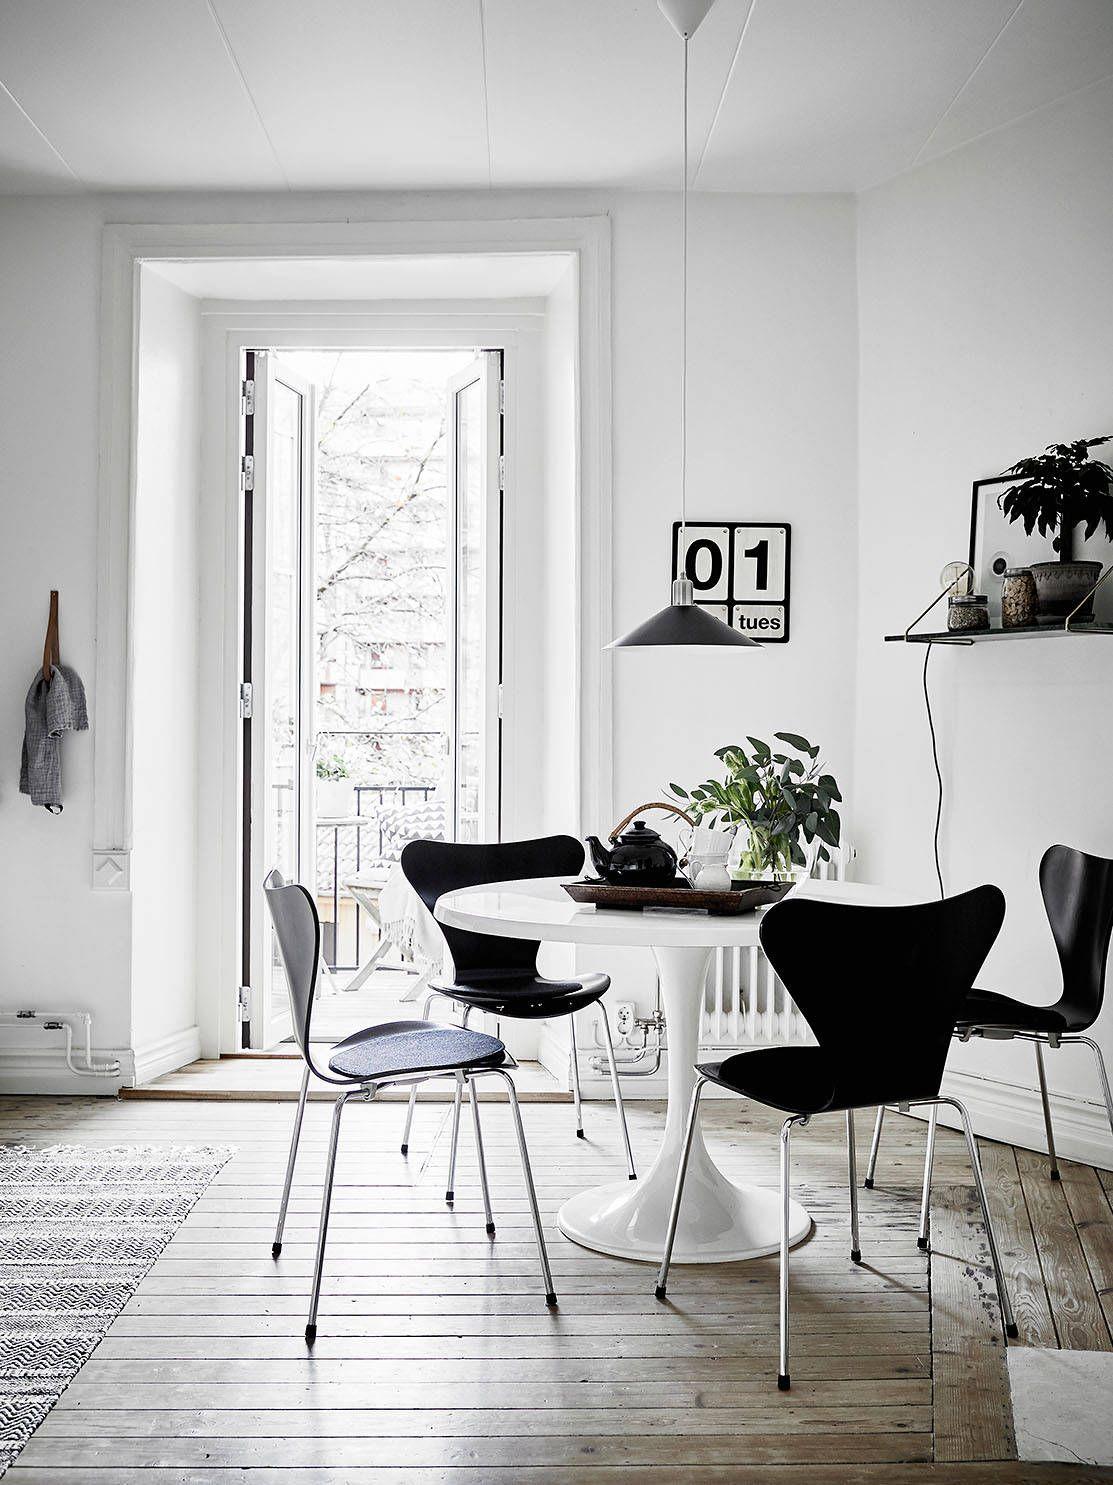 Black & white magic in an Swedish apartment Daily Dream Decor | Deco ...